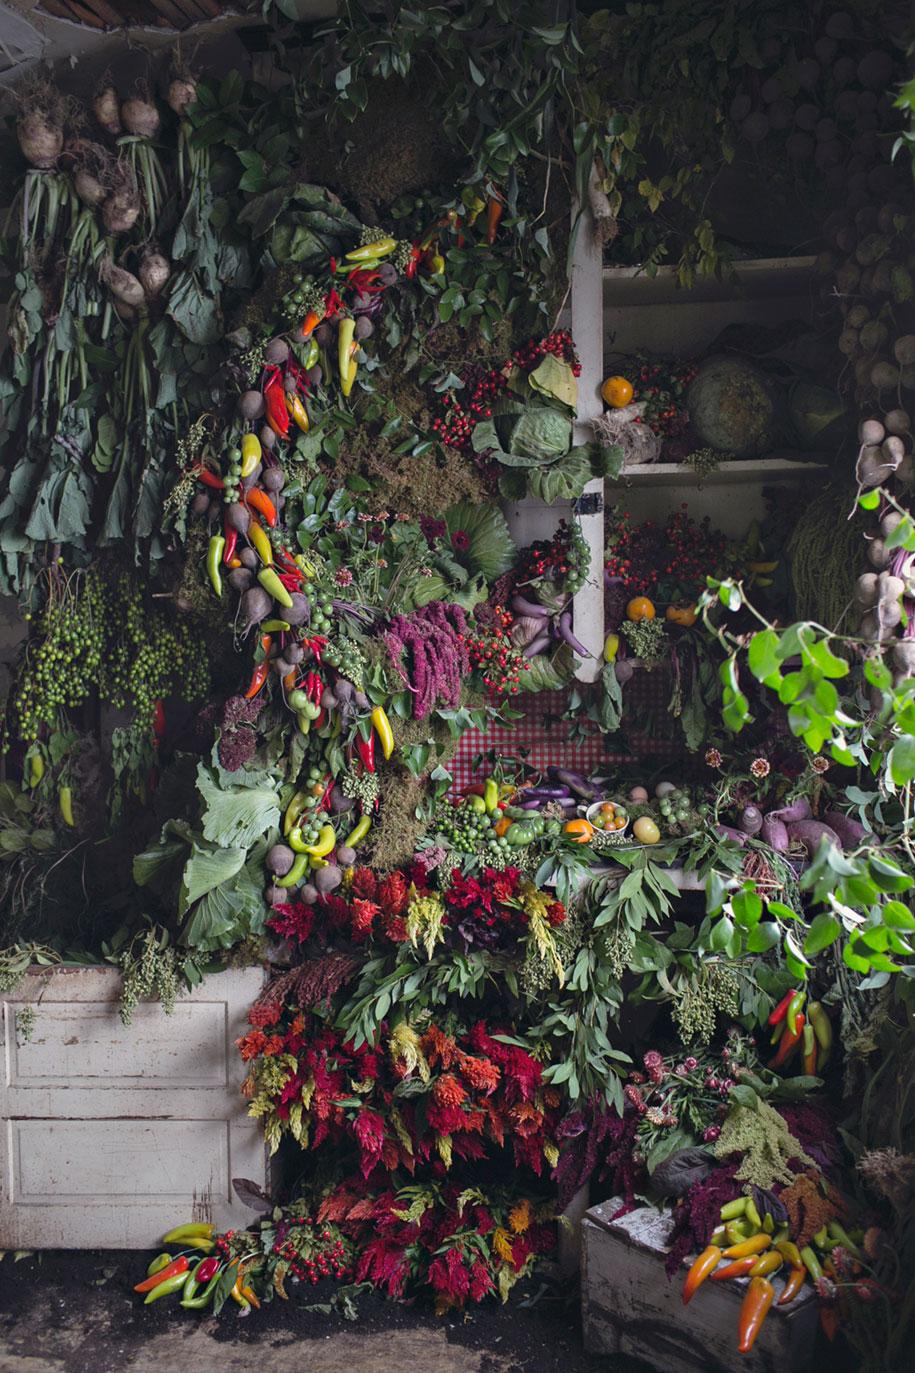 abandoned-house-transformed-flower-house-lisa-waud-heather-saunders-13